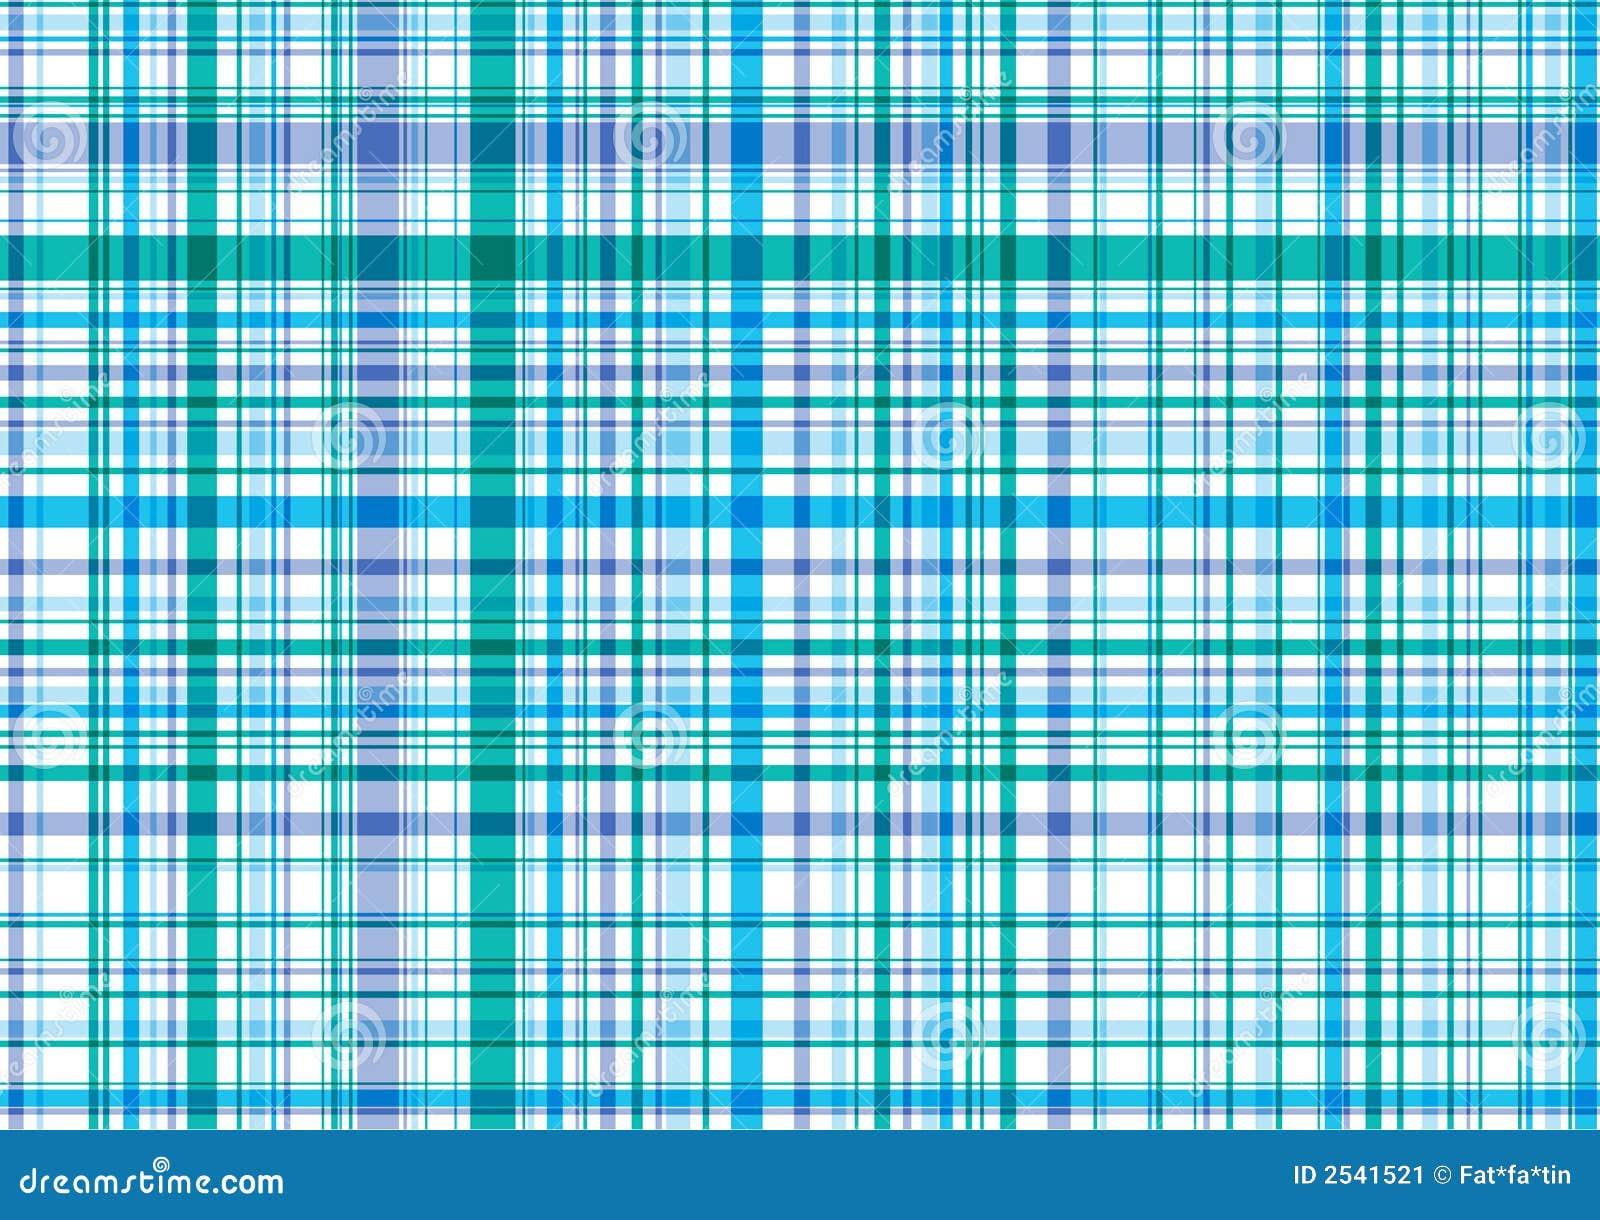 Blue And Purple Plaid Pattern Stock Image - Image: 2541521